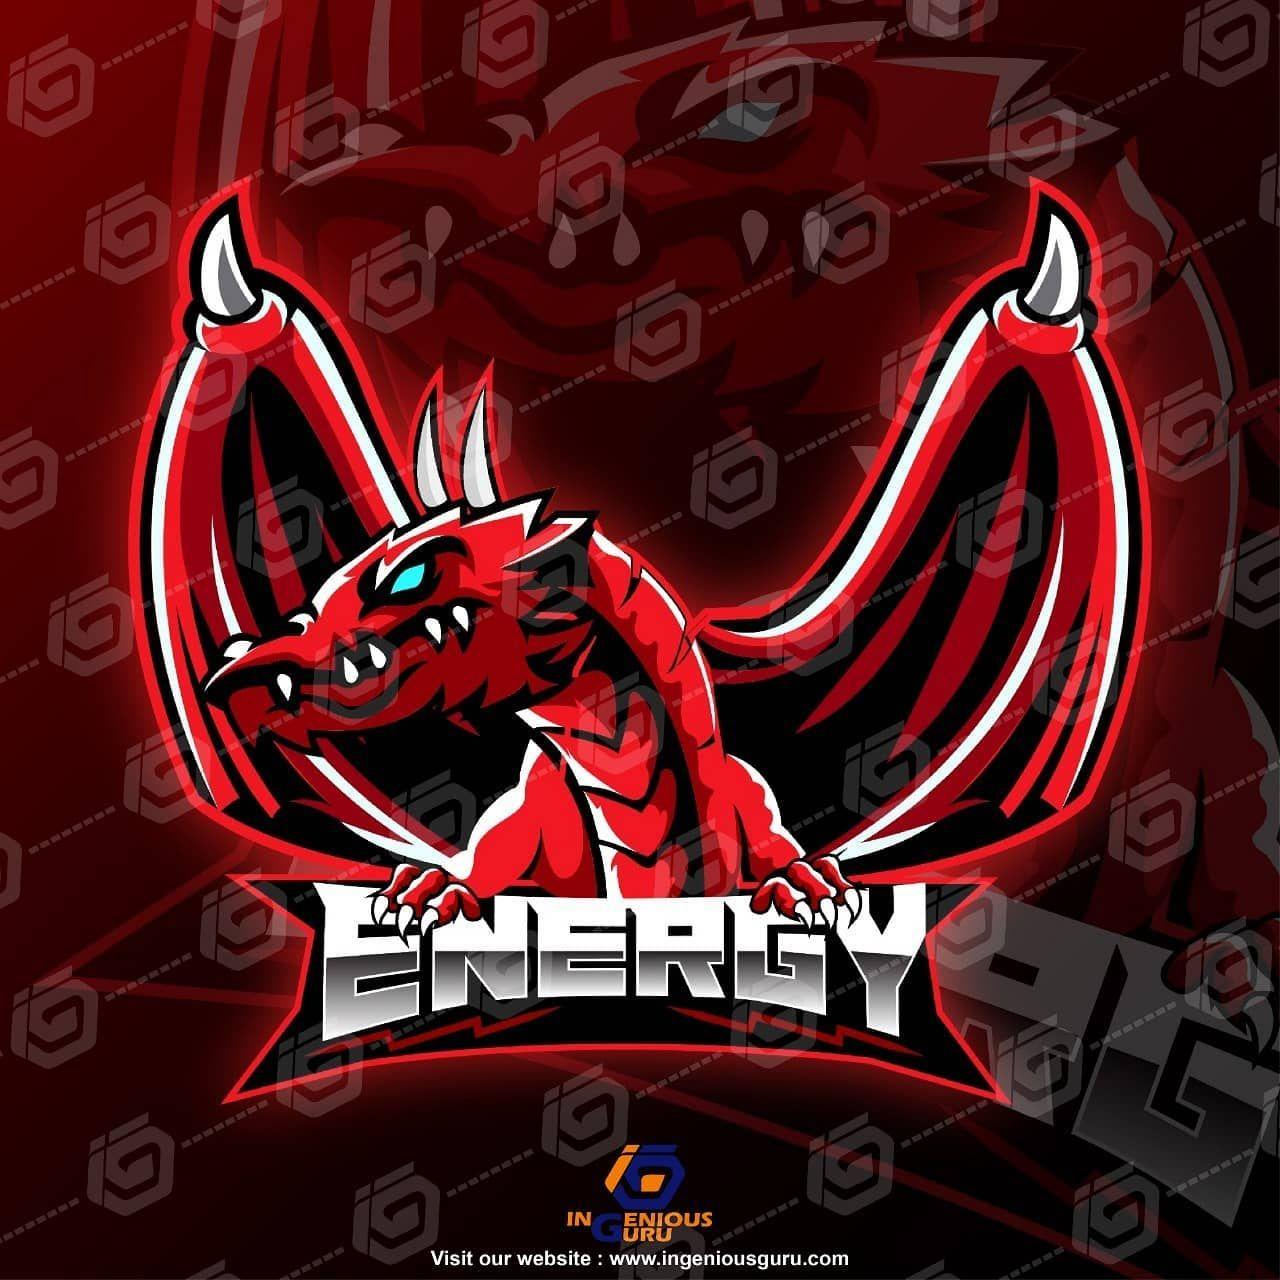 Pin By Ingenious Guru On Ilustracion De Dragon In 2020 Logo Design Neon Signs Design